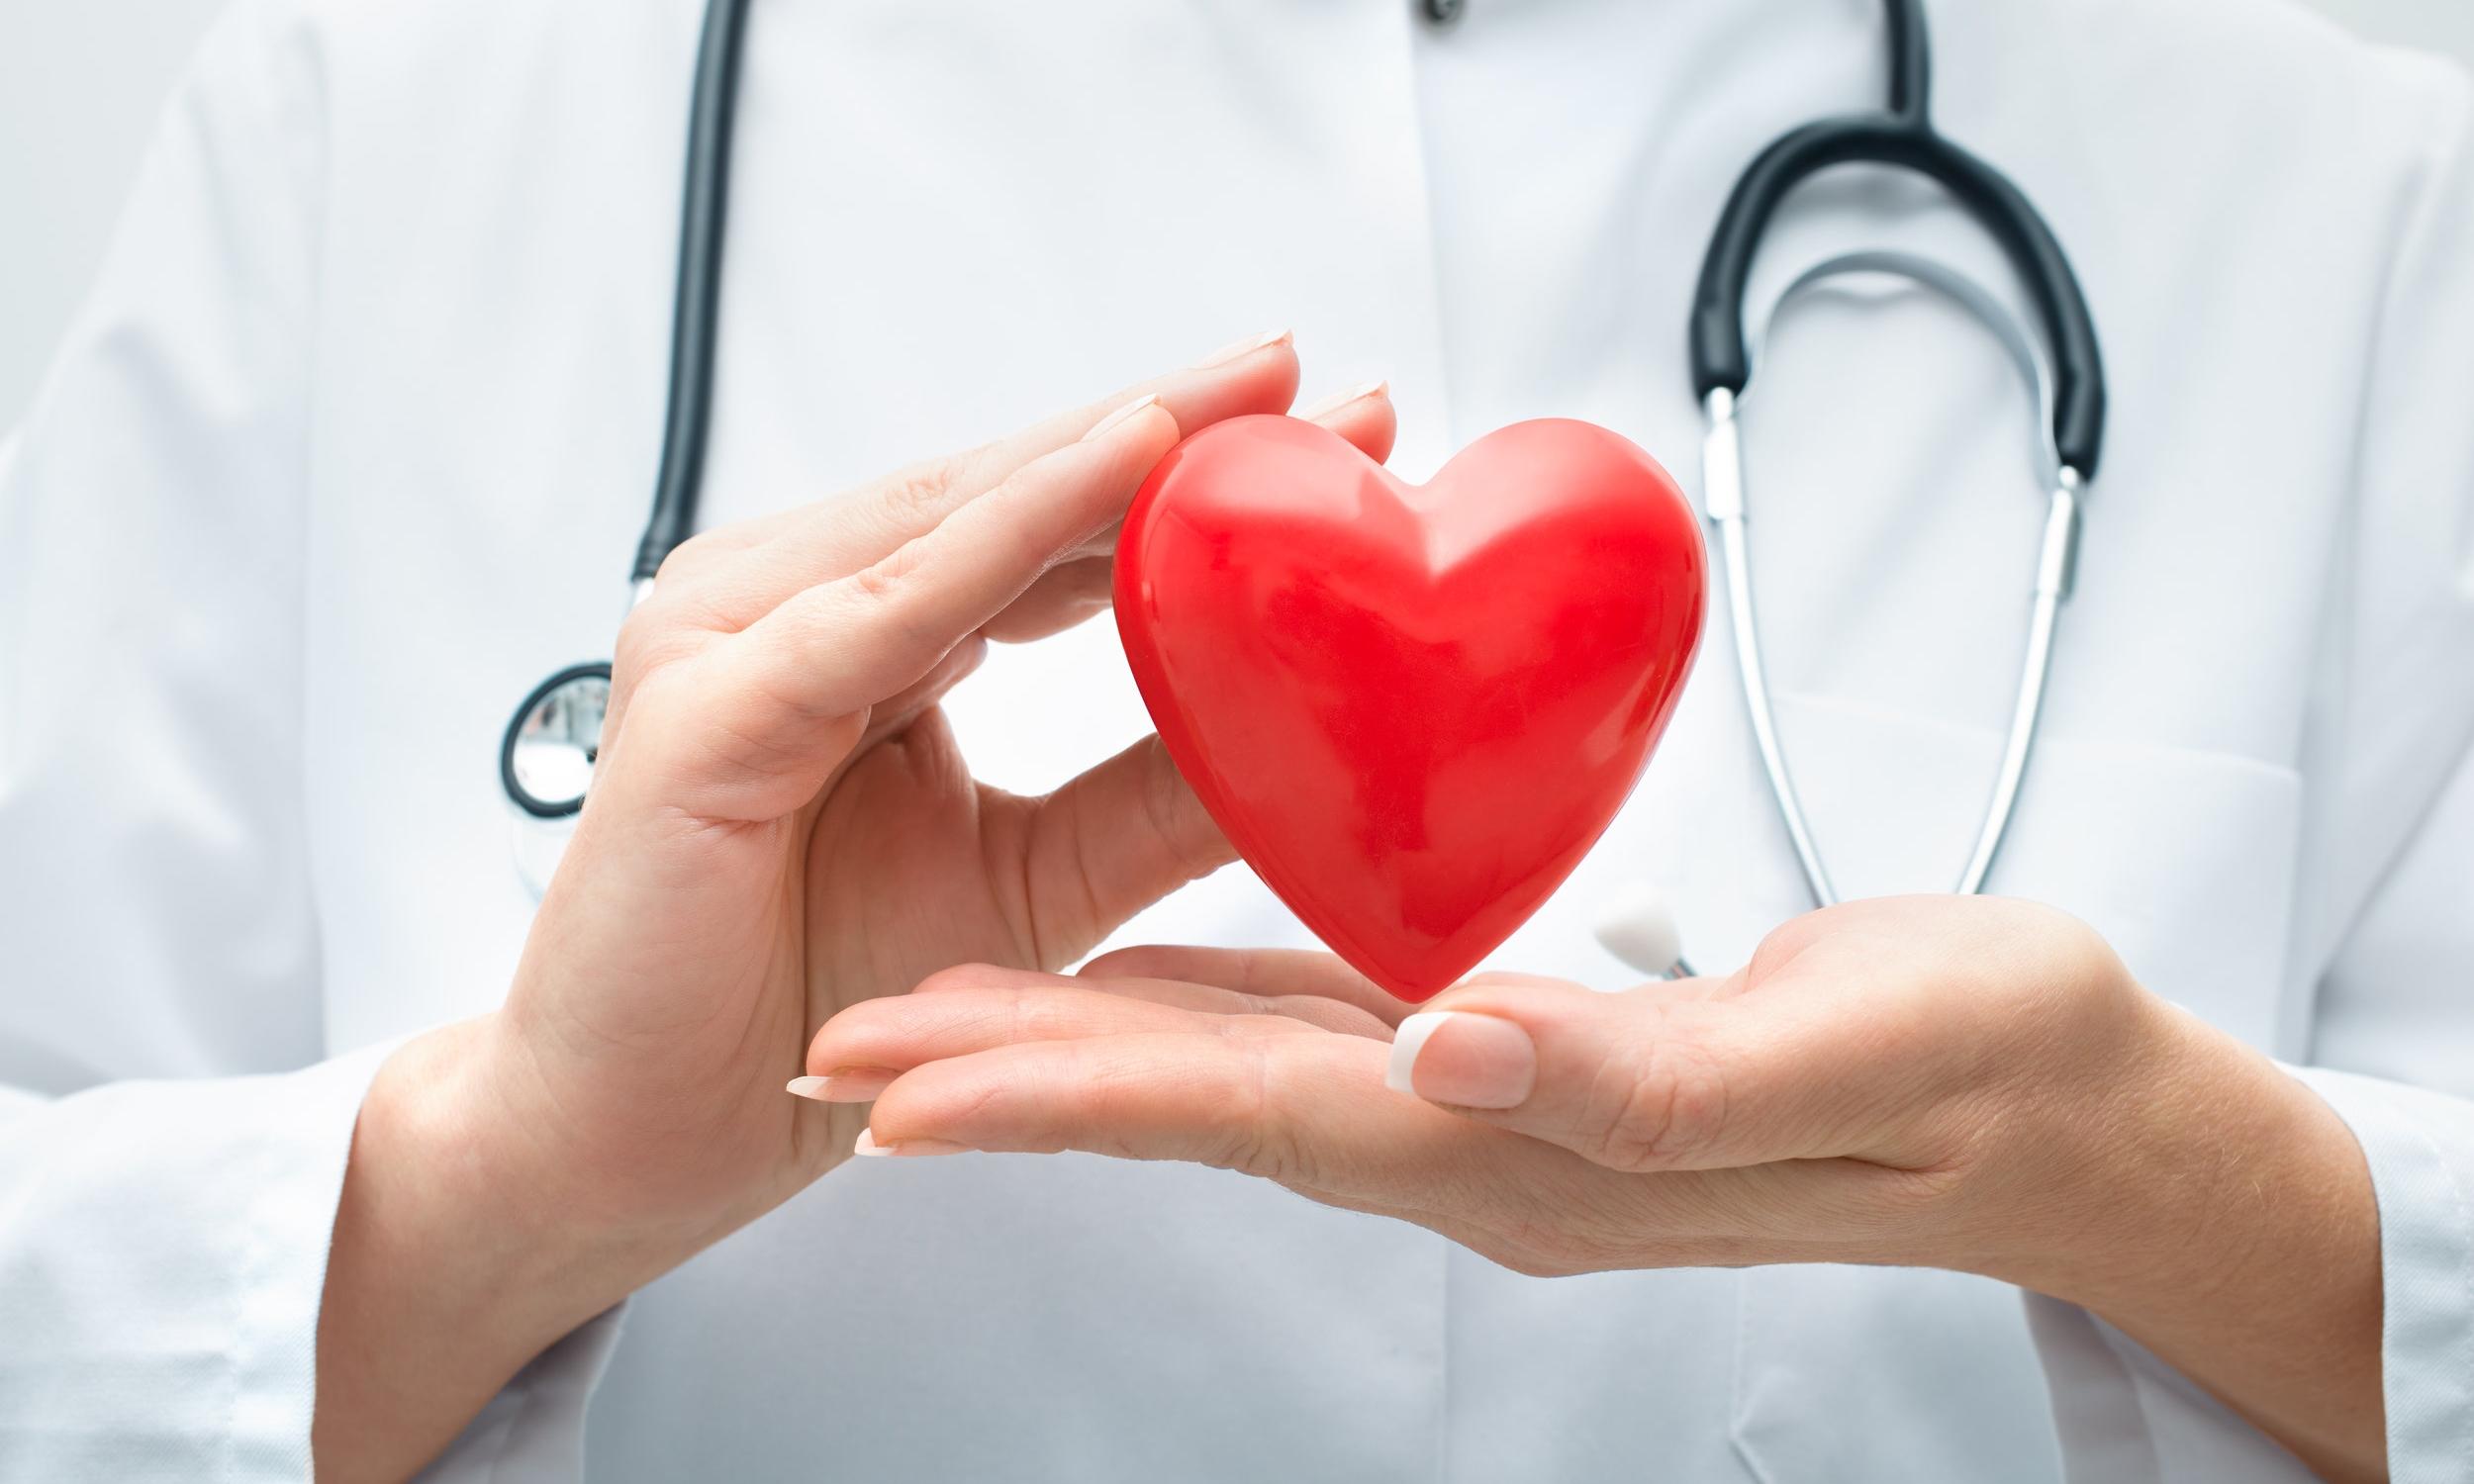 Heart Disease, Cholesterol & Diabetes